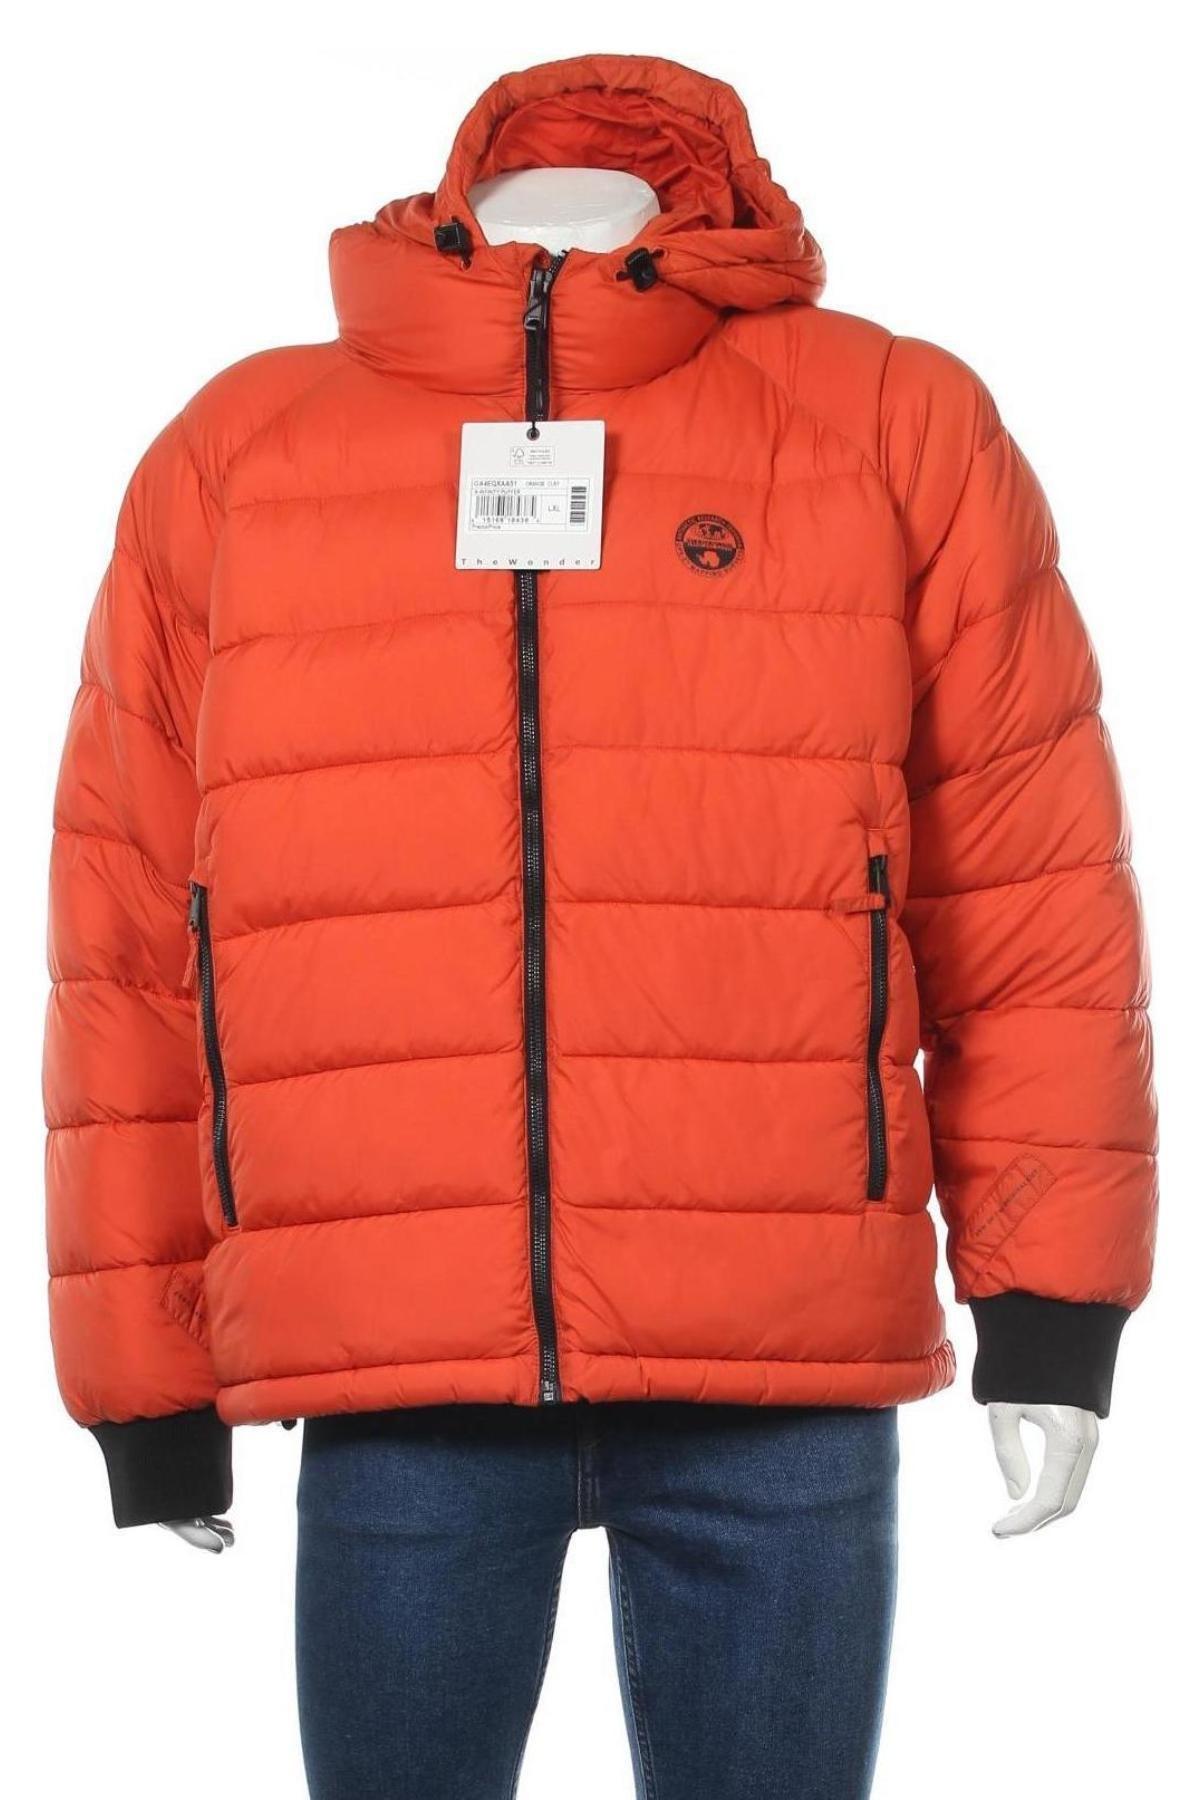 Мъжко яке Napapijri, Размер XL, Цвят Оранжев, Полиамид, Цена 396,75лв.